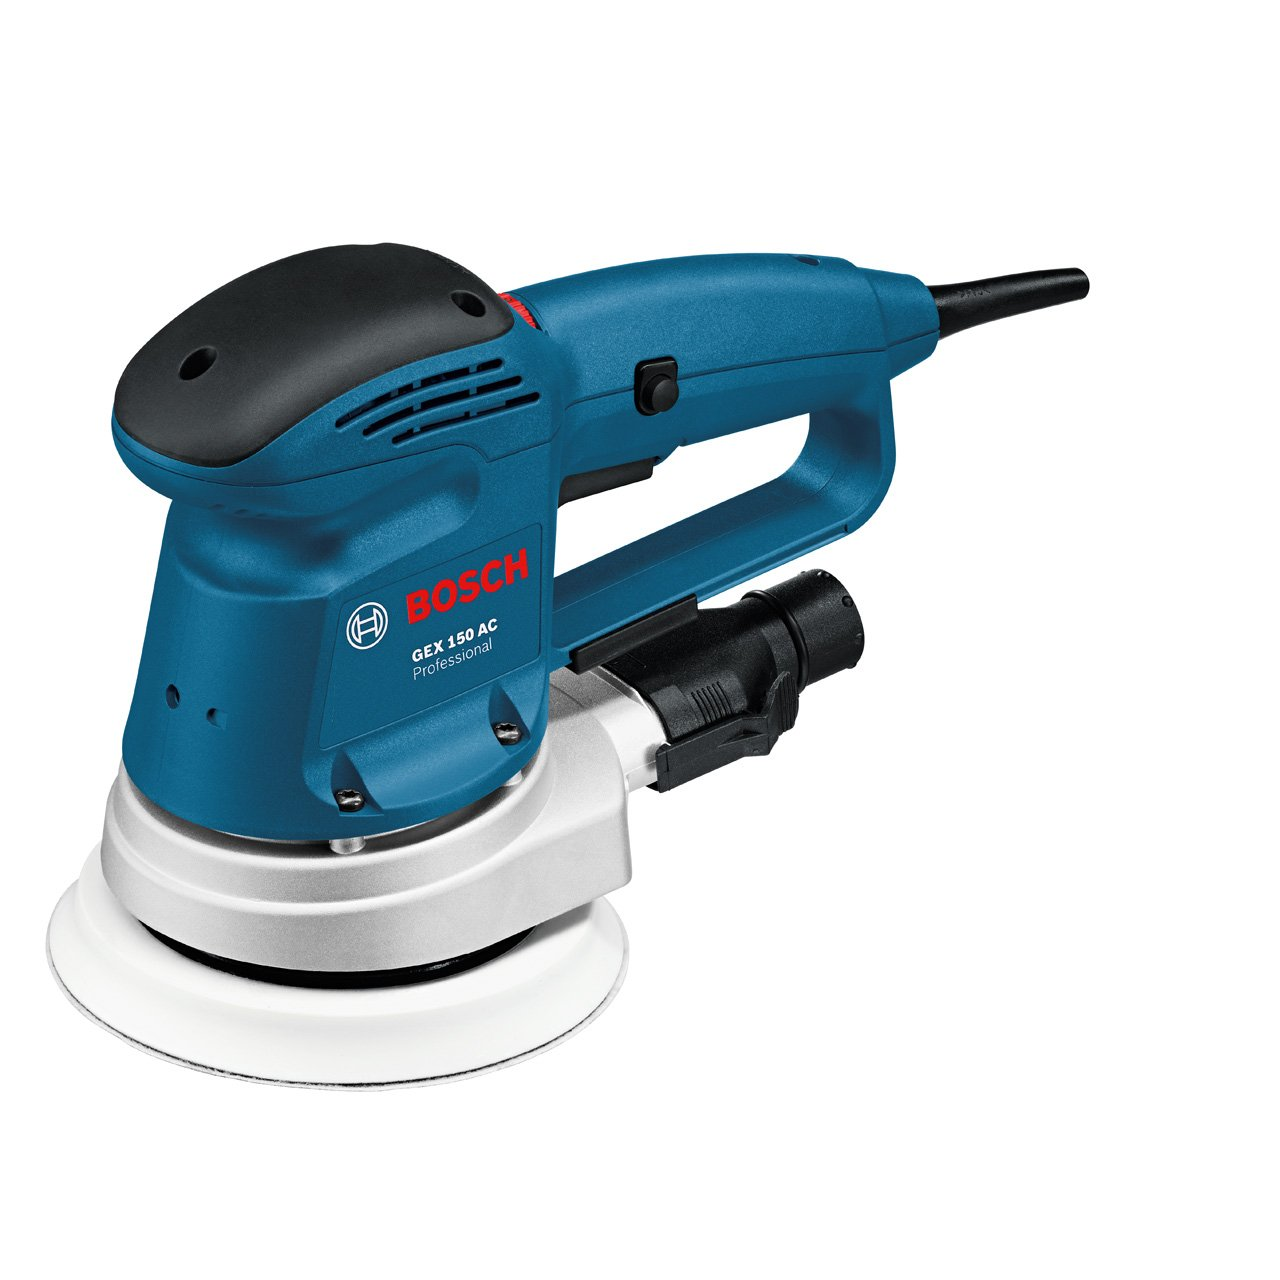 Bosch Professional 0601372768 Ponceuse excentrique GEX 150 AC